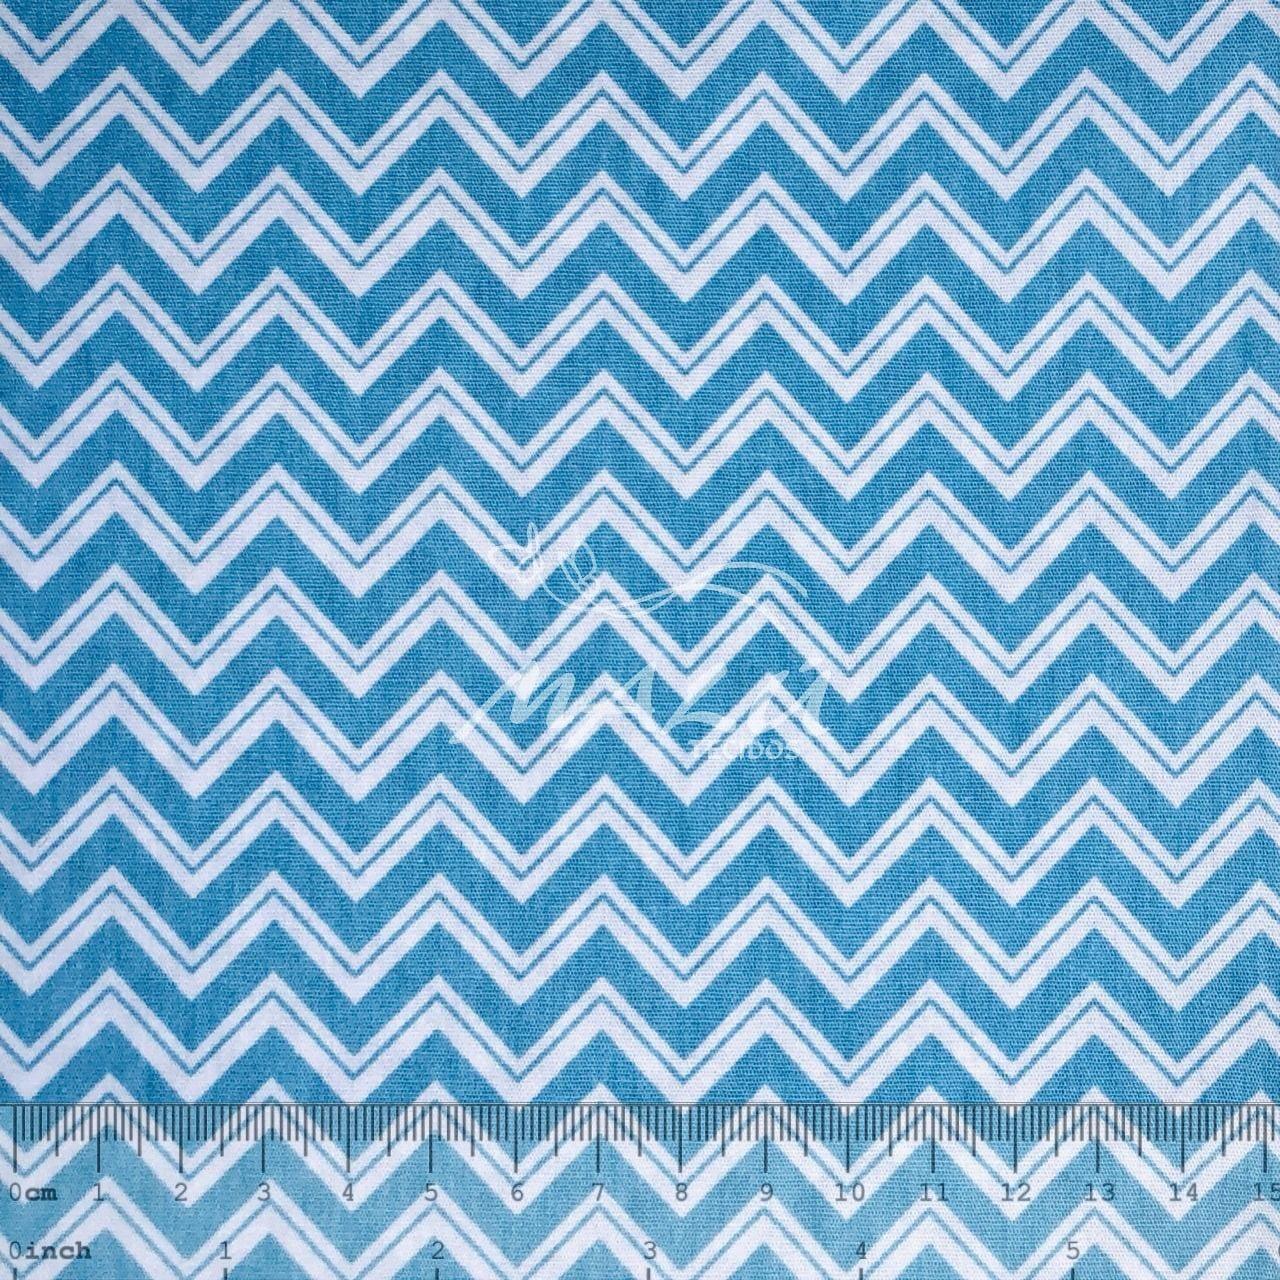 Tricoline Chevron Largo Azul com Filetes